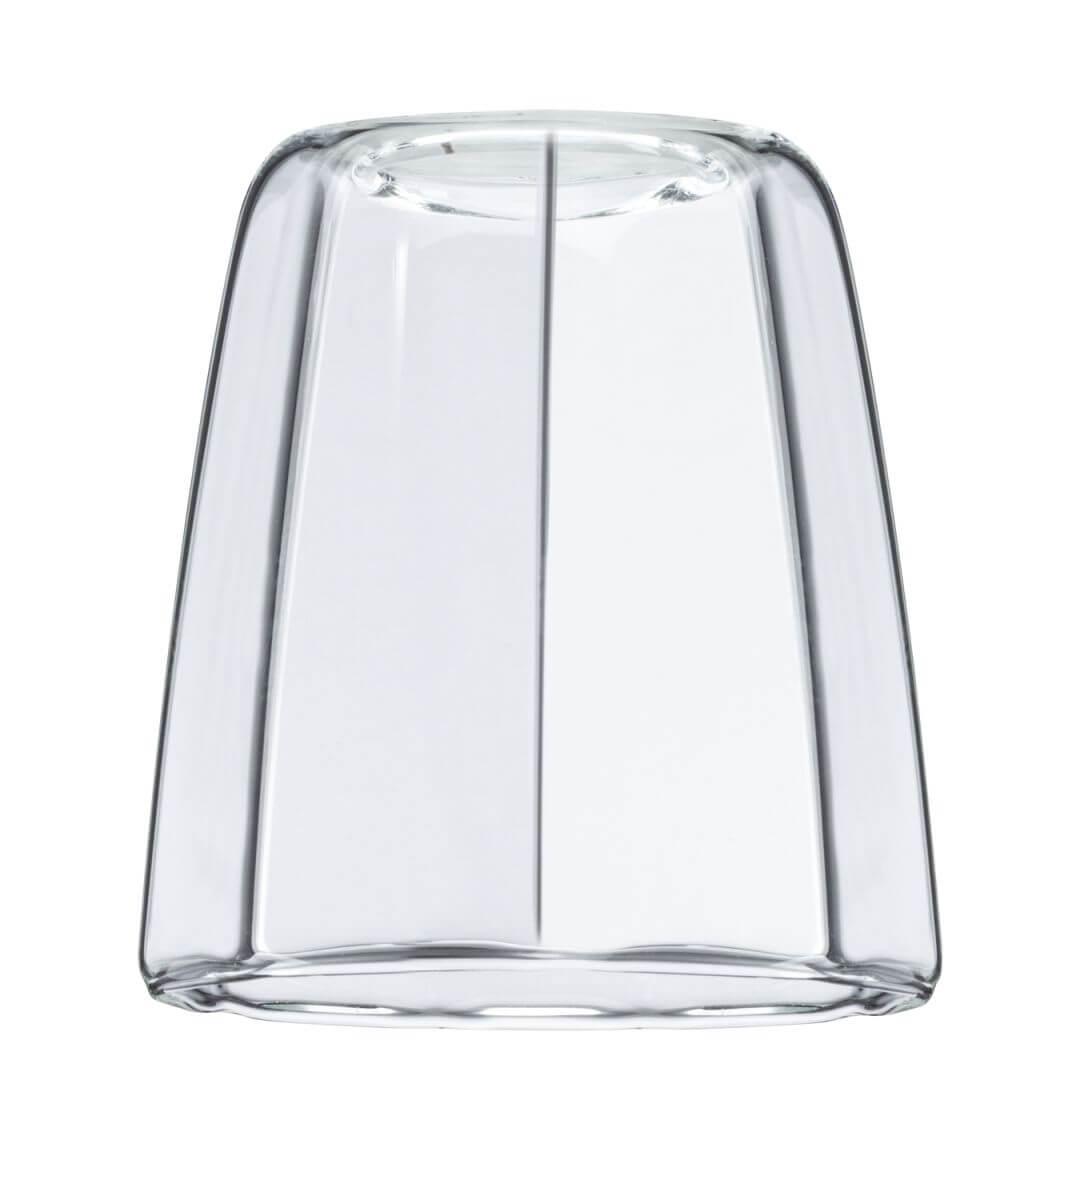 Paulmann DecoSystems Schirm Vico Klarglas max 50 W